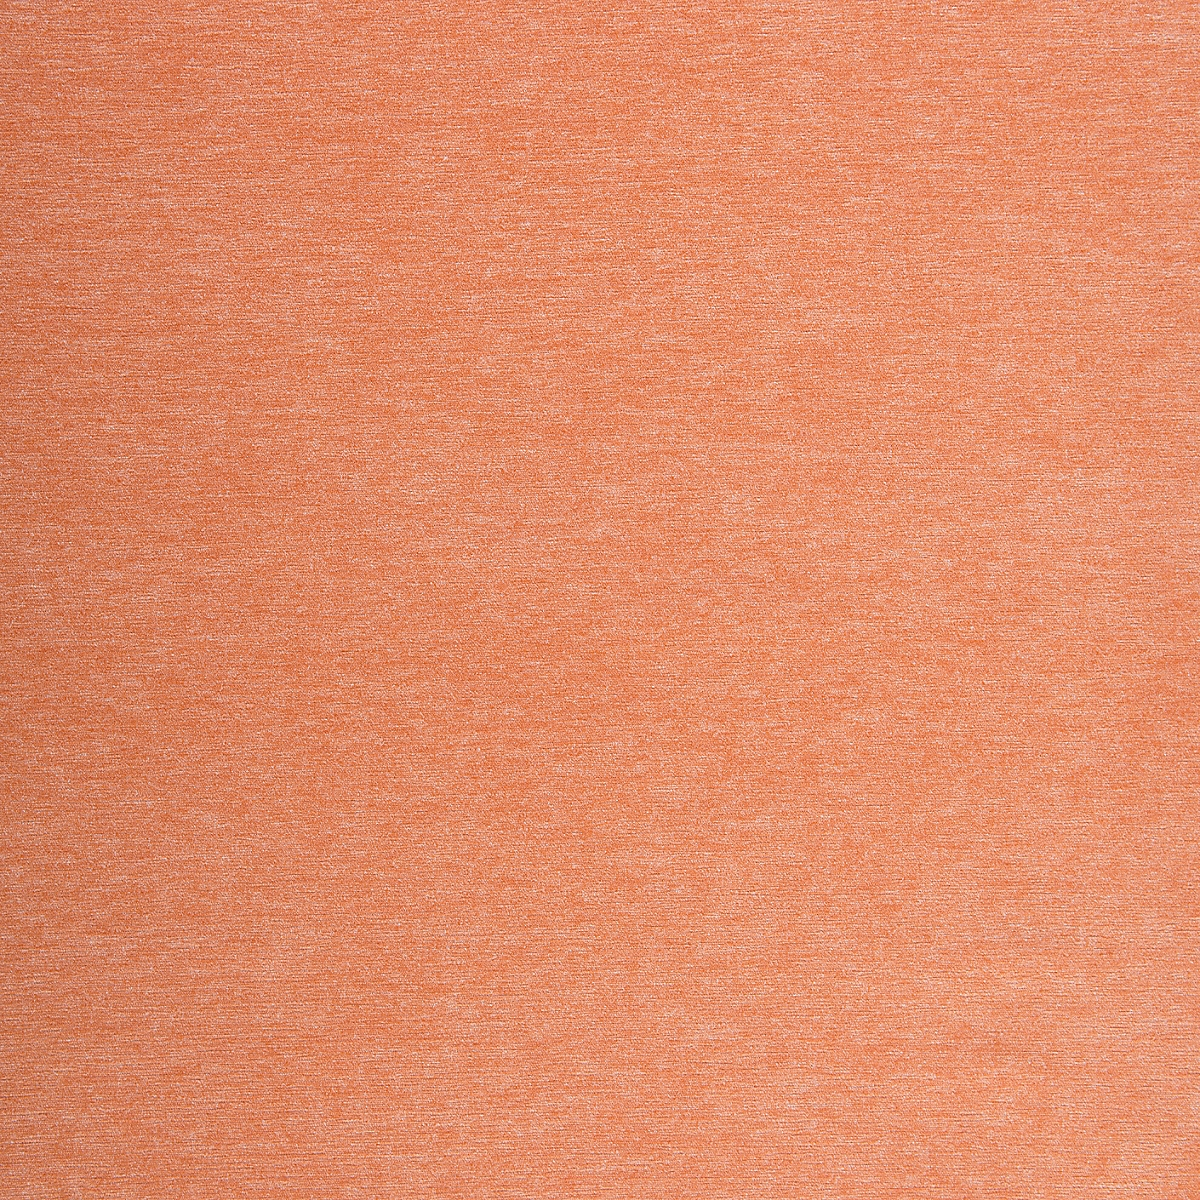 Serenity: Mango (fabric yardage)